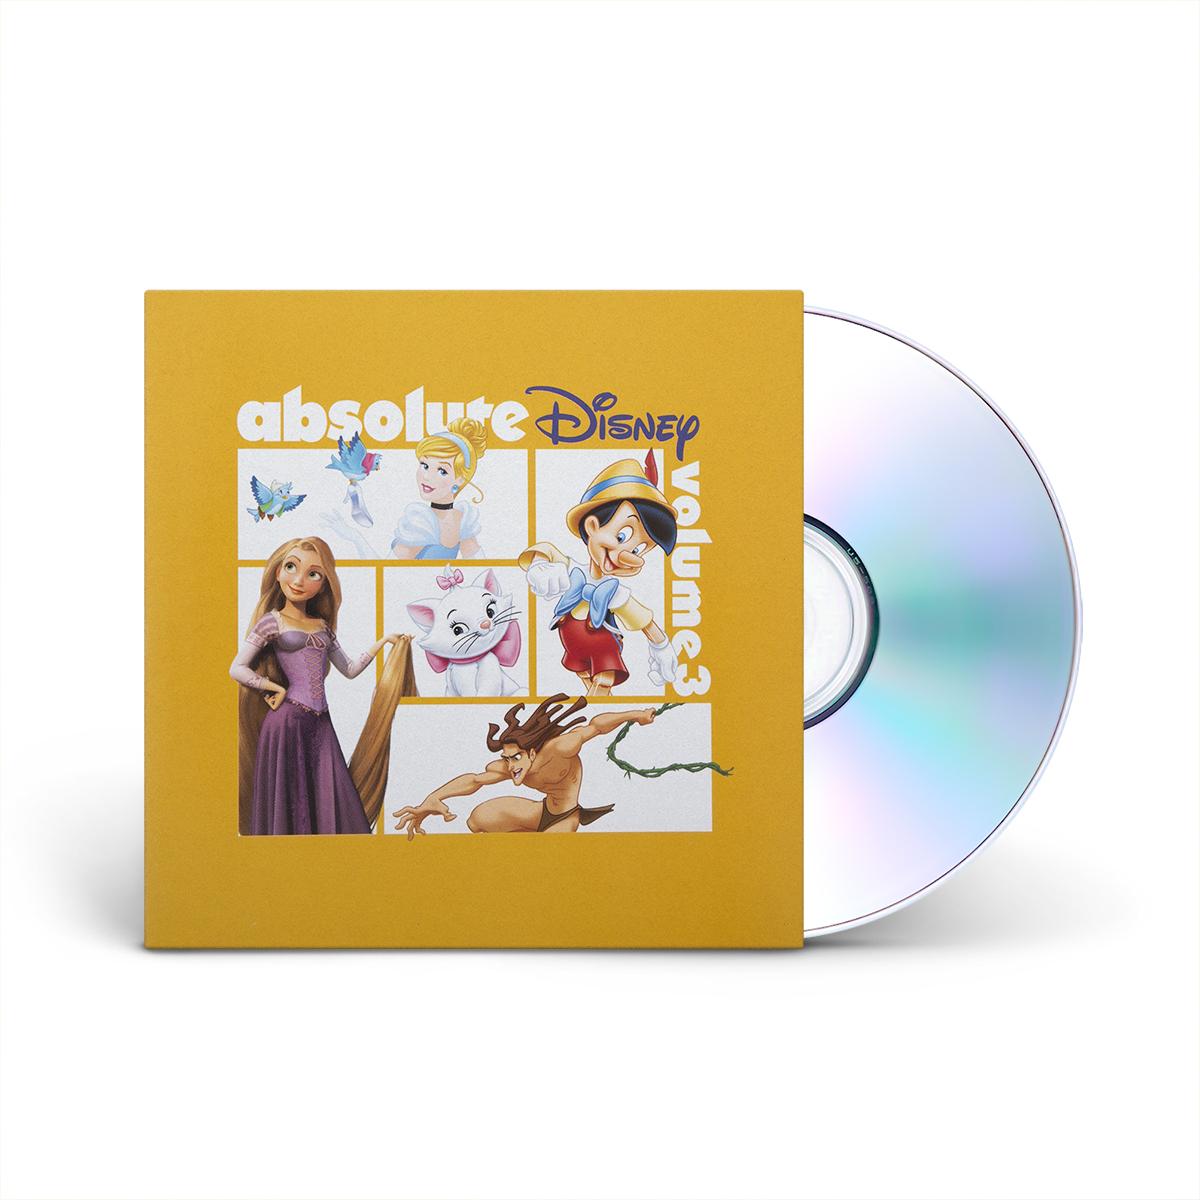 Absolute Disney, Vol. 3